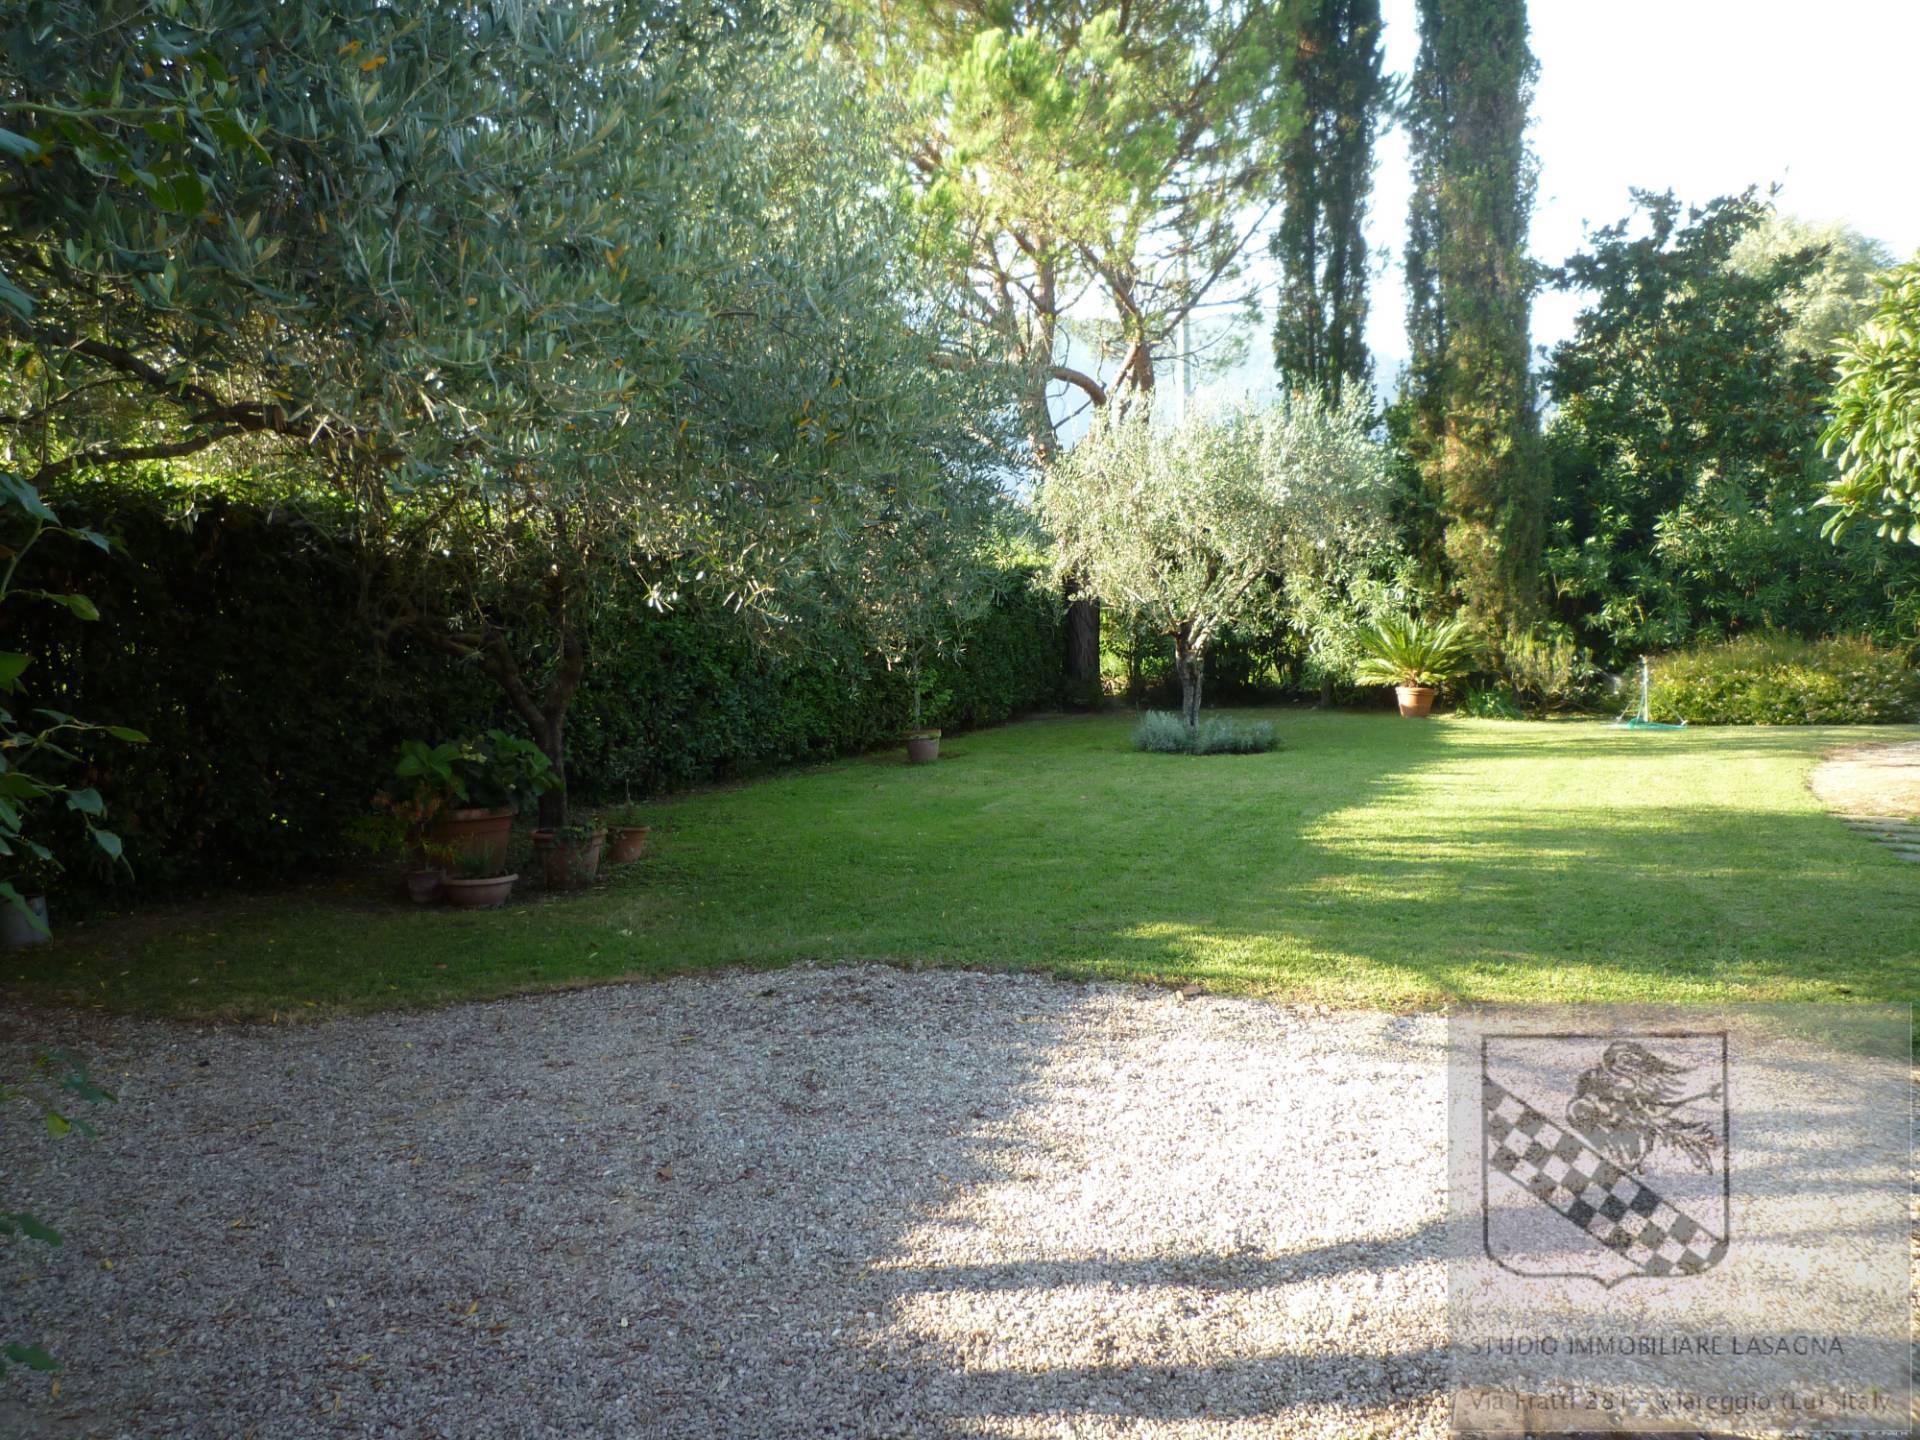 Villa in Vendita a Camaiore: 5 locali, 120 mq - Foto 3